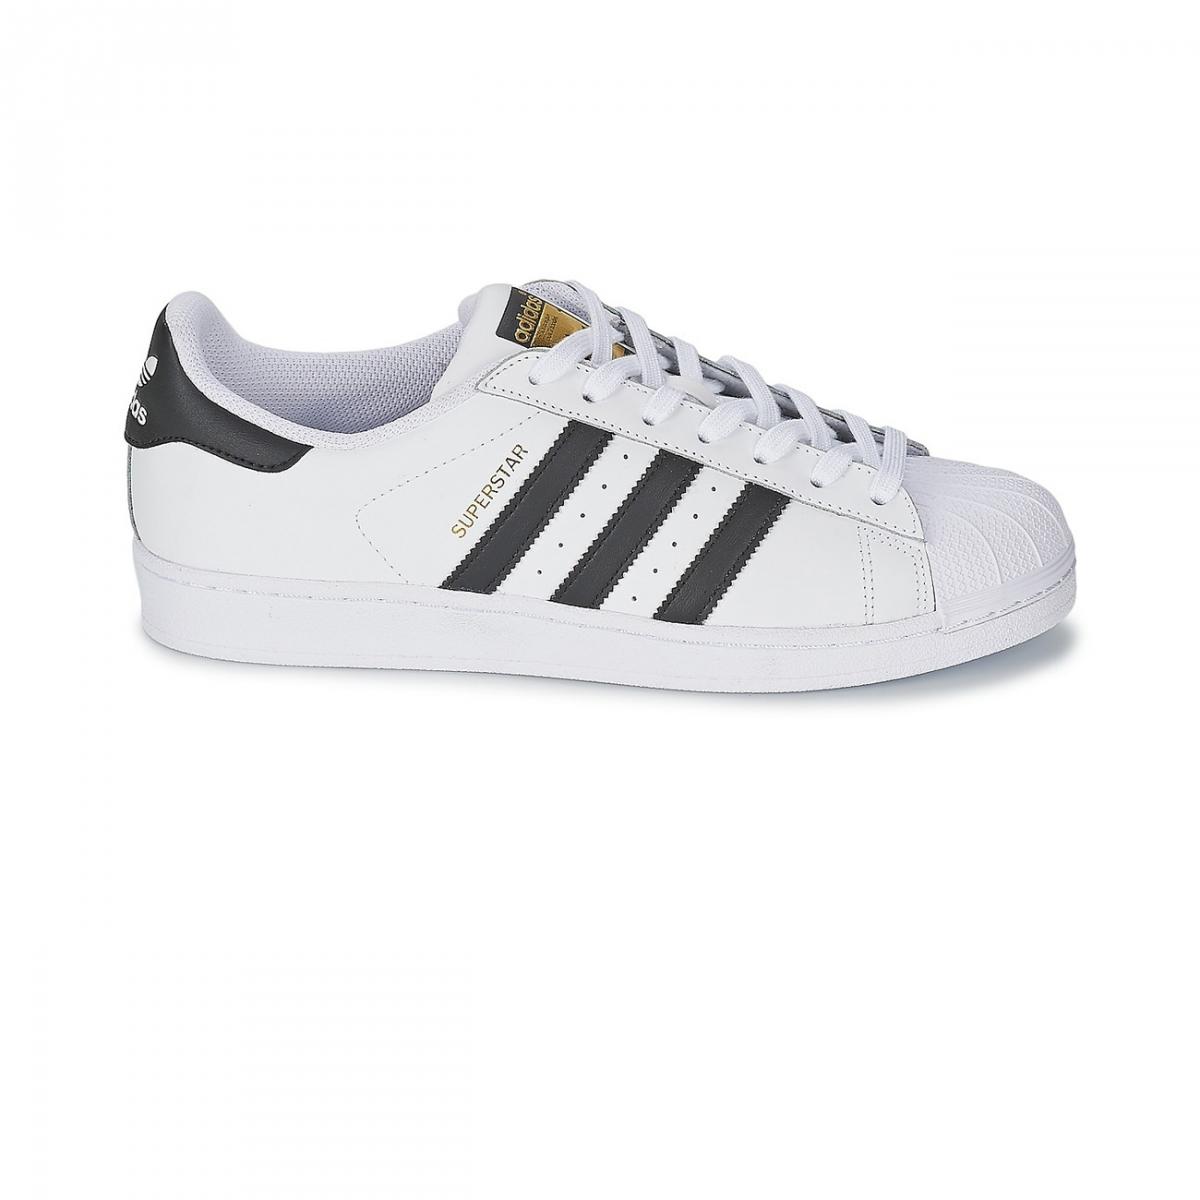 Chaussures Superstar Blanc/Noir